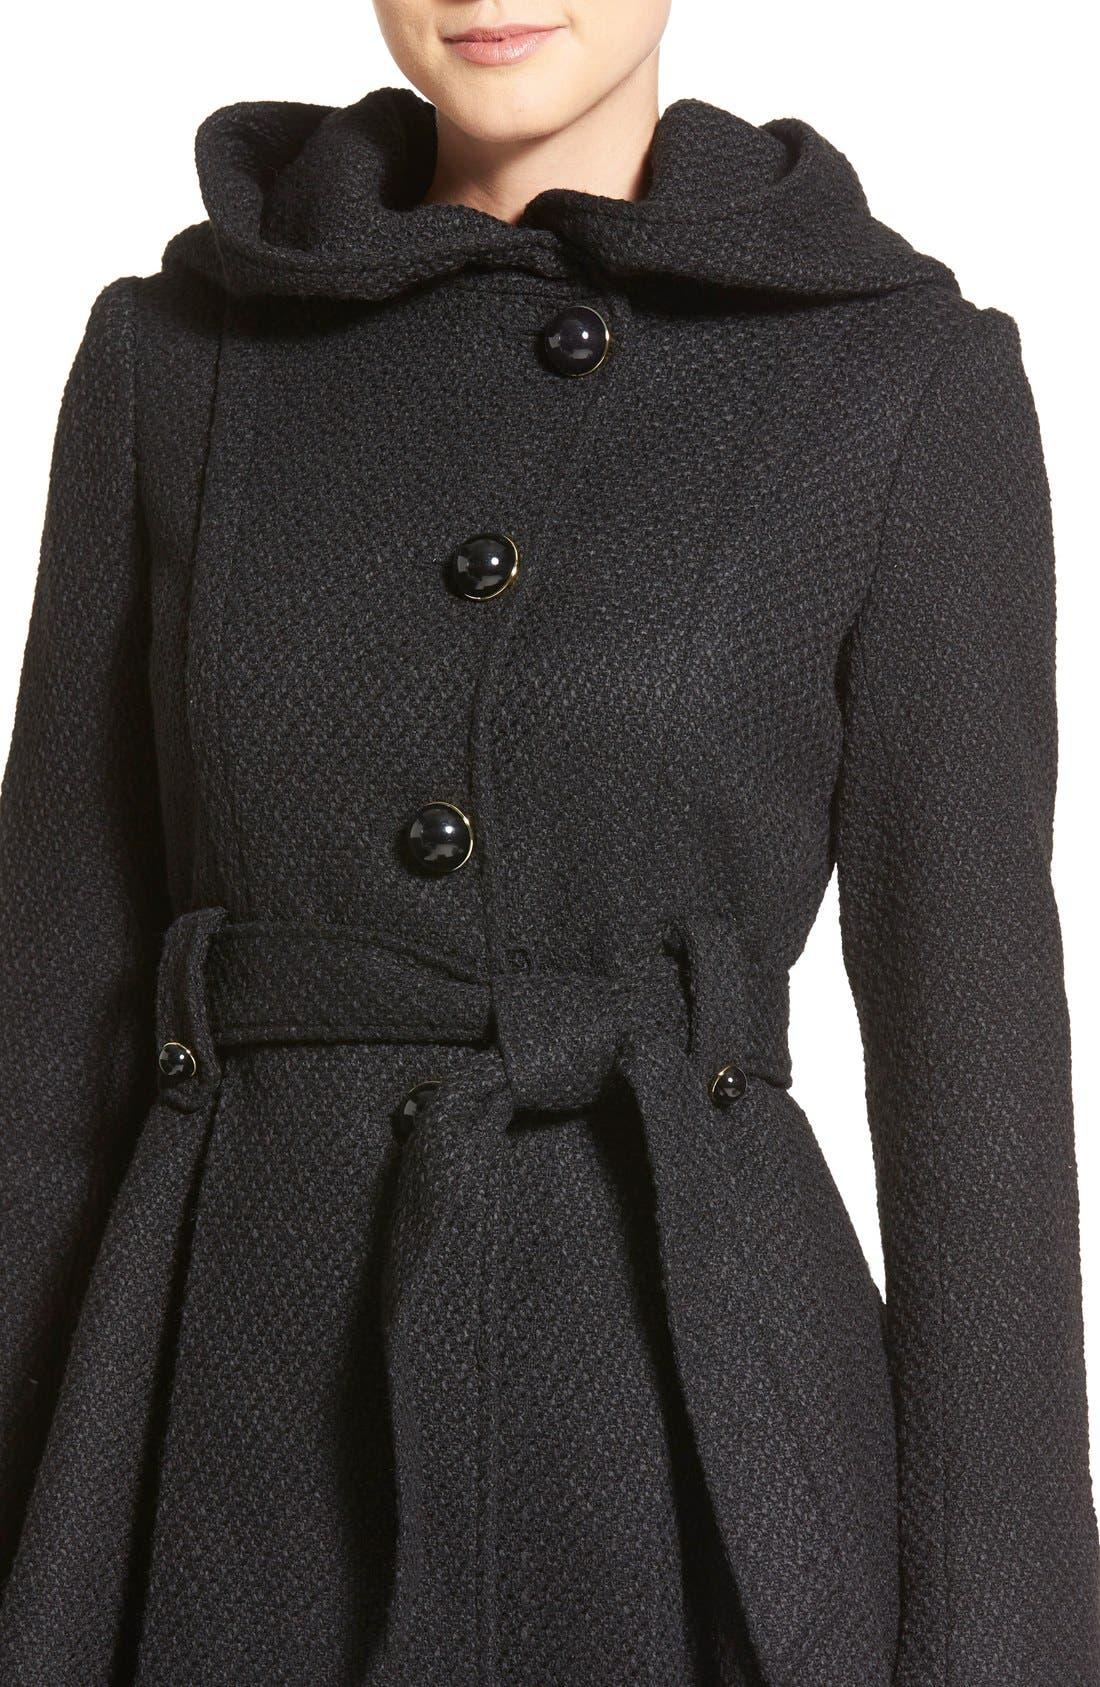 Belted Hooded Skirted Coat,                             Alternate thumbnail 17, color,